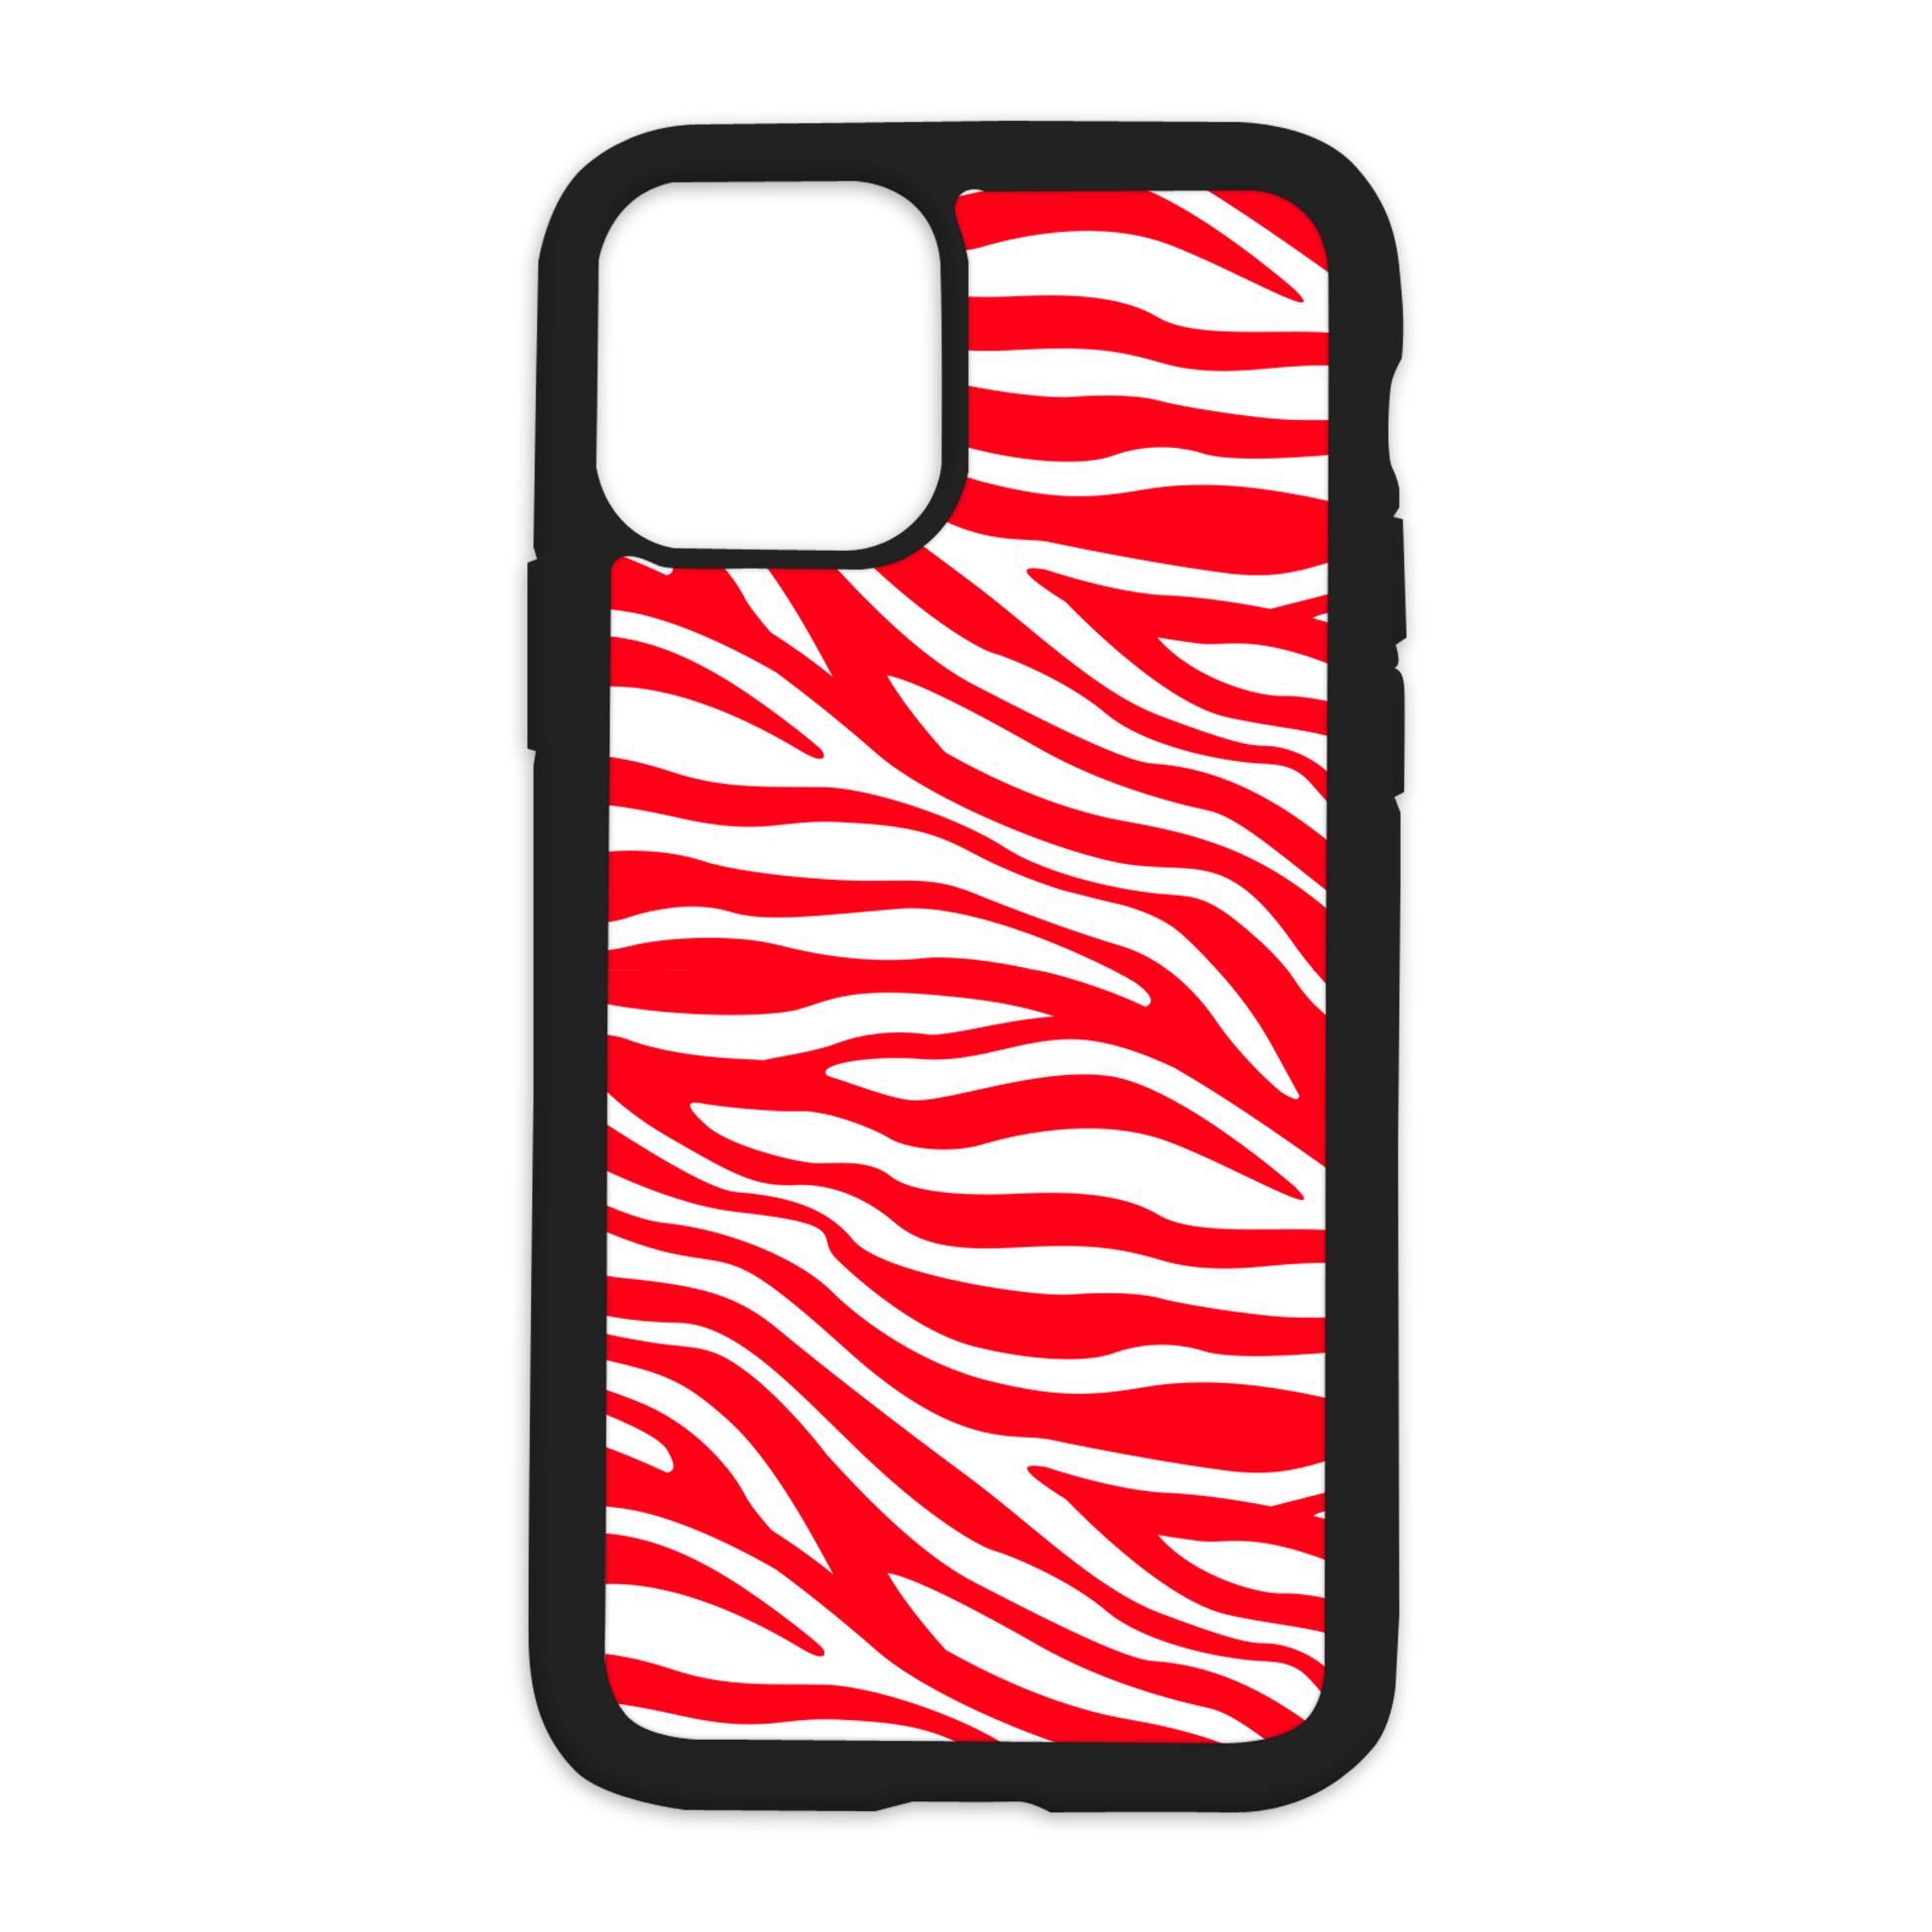 Zebra Print Design On Black Phone Case - 6/6s+ / Red